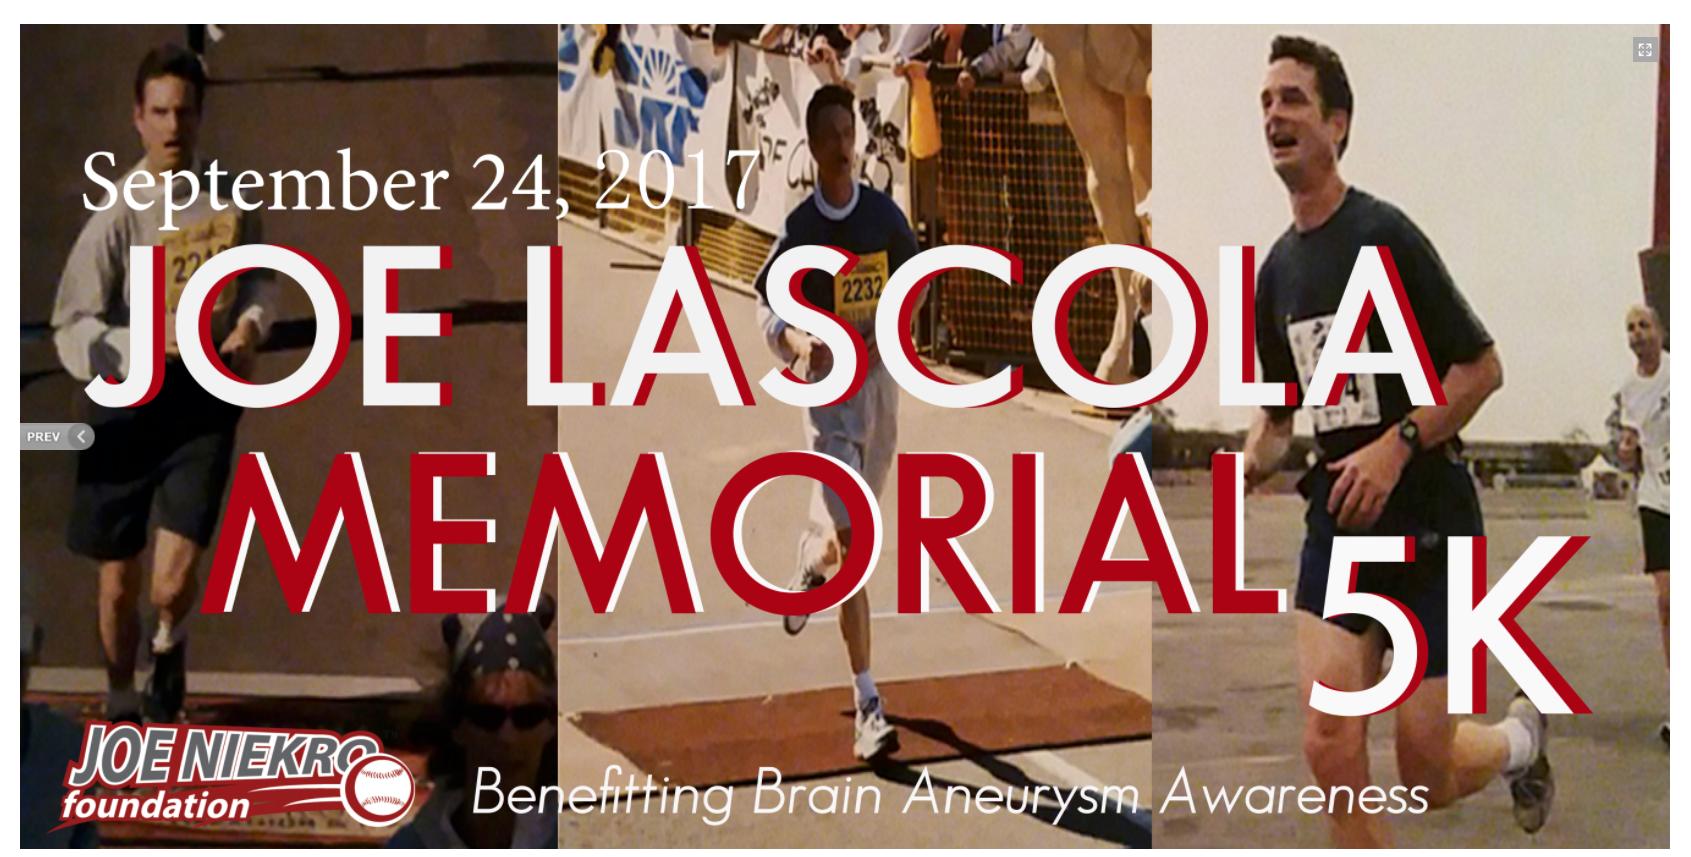 http://www.joeniekrofoundation.com/events/joe-lascola-memorial-walk/attachment/untitled-1/